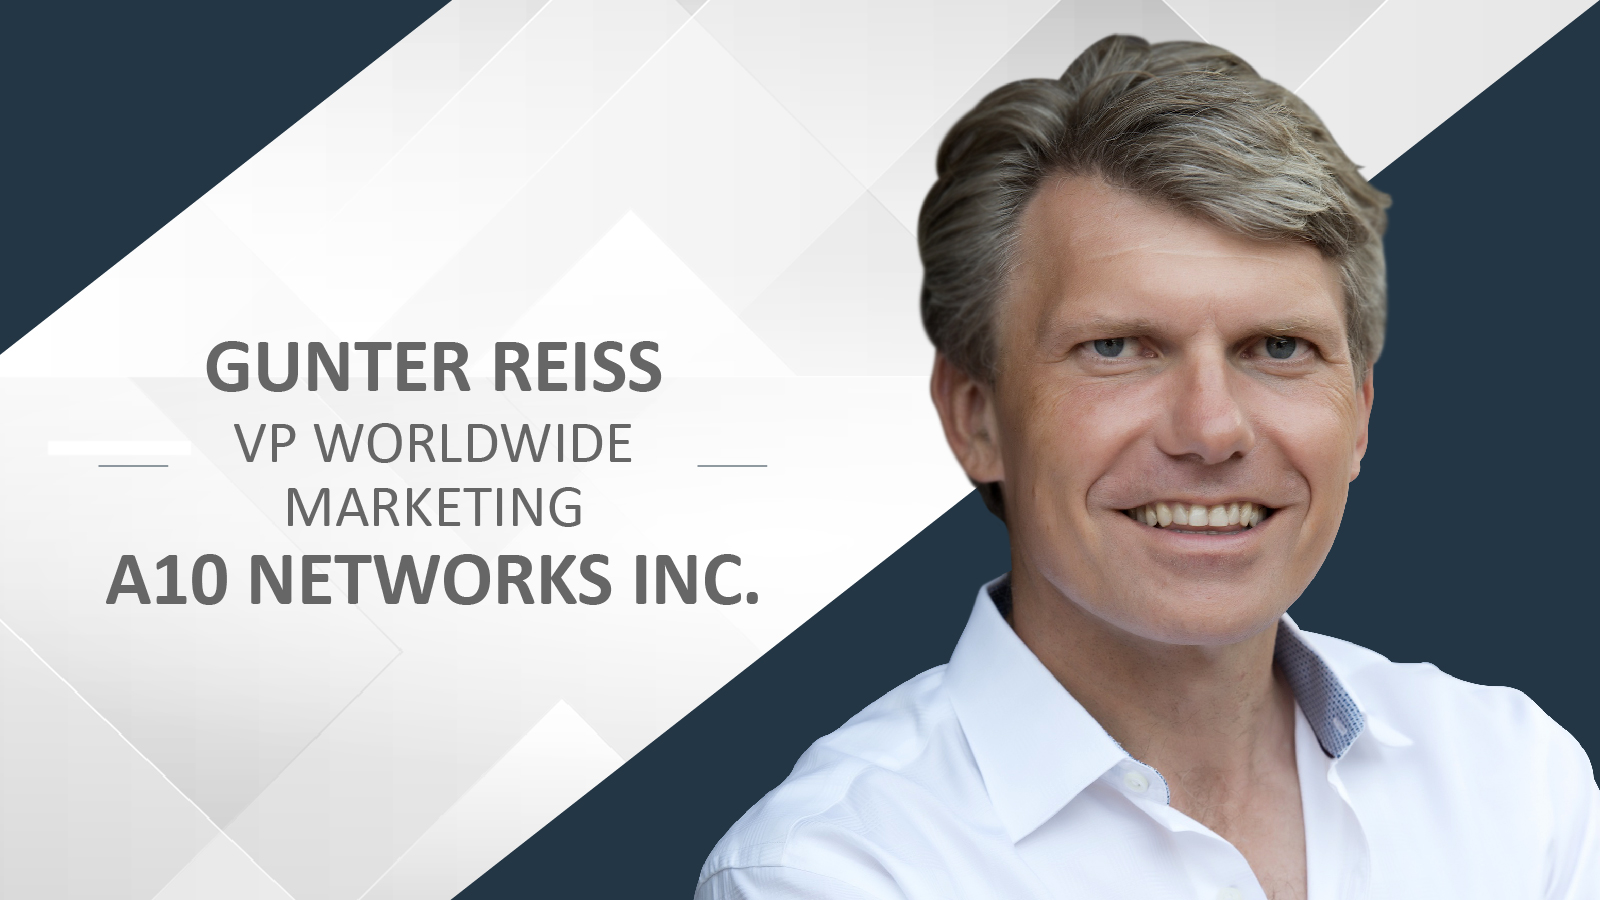 security providers, Cyber wars, Gunter Reiss, VP Worldwide Marketing, A10 Networks Inc, IoT,